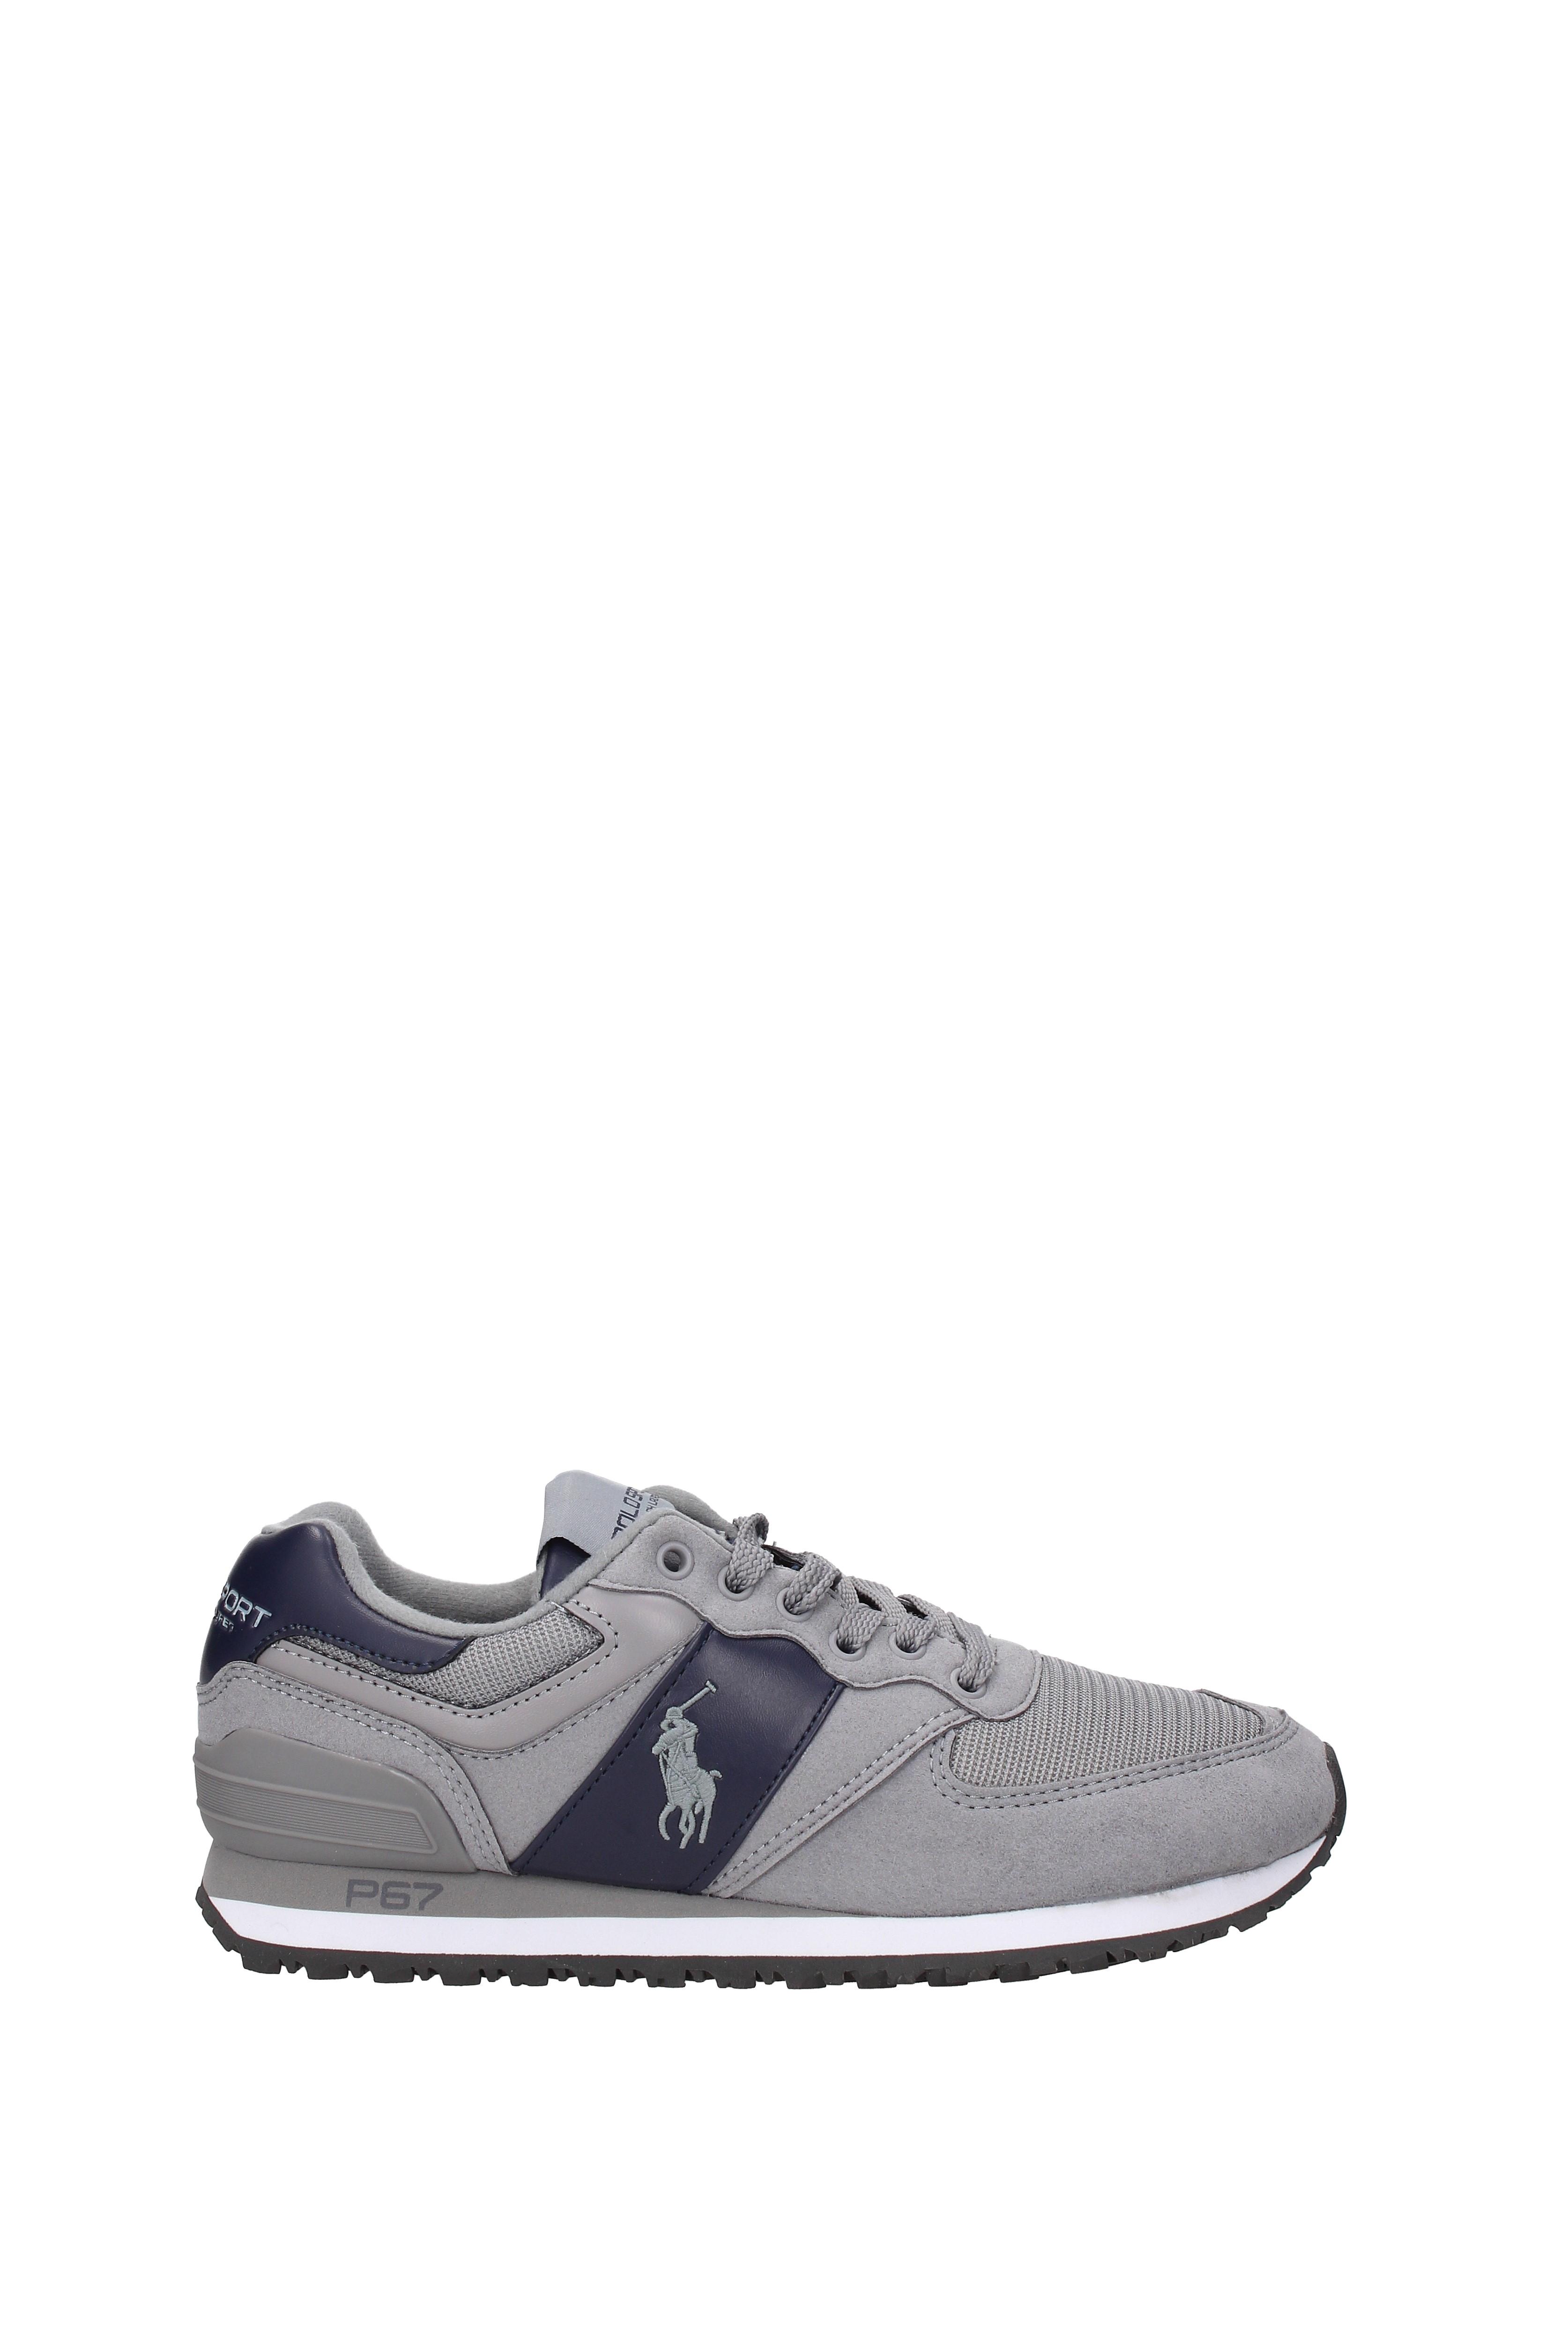 Sneakers Ralph Lauren Sport slaton (80958012) pony Uomo - Camoscio (80958012) slaton c7013c